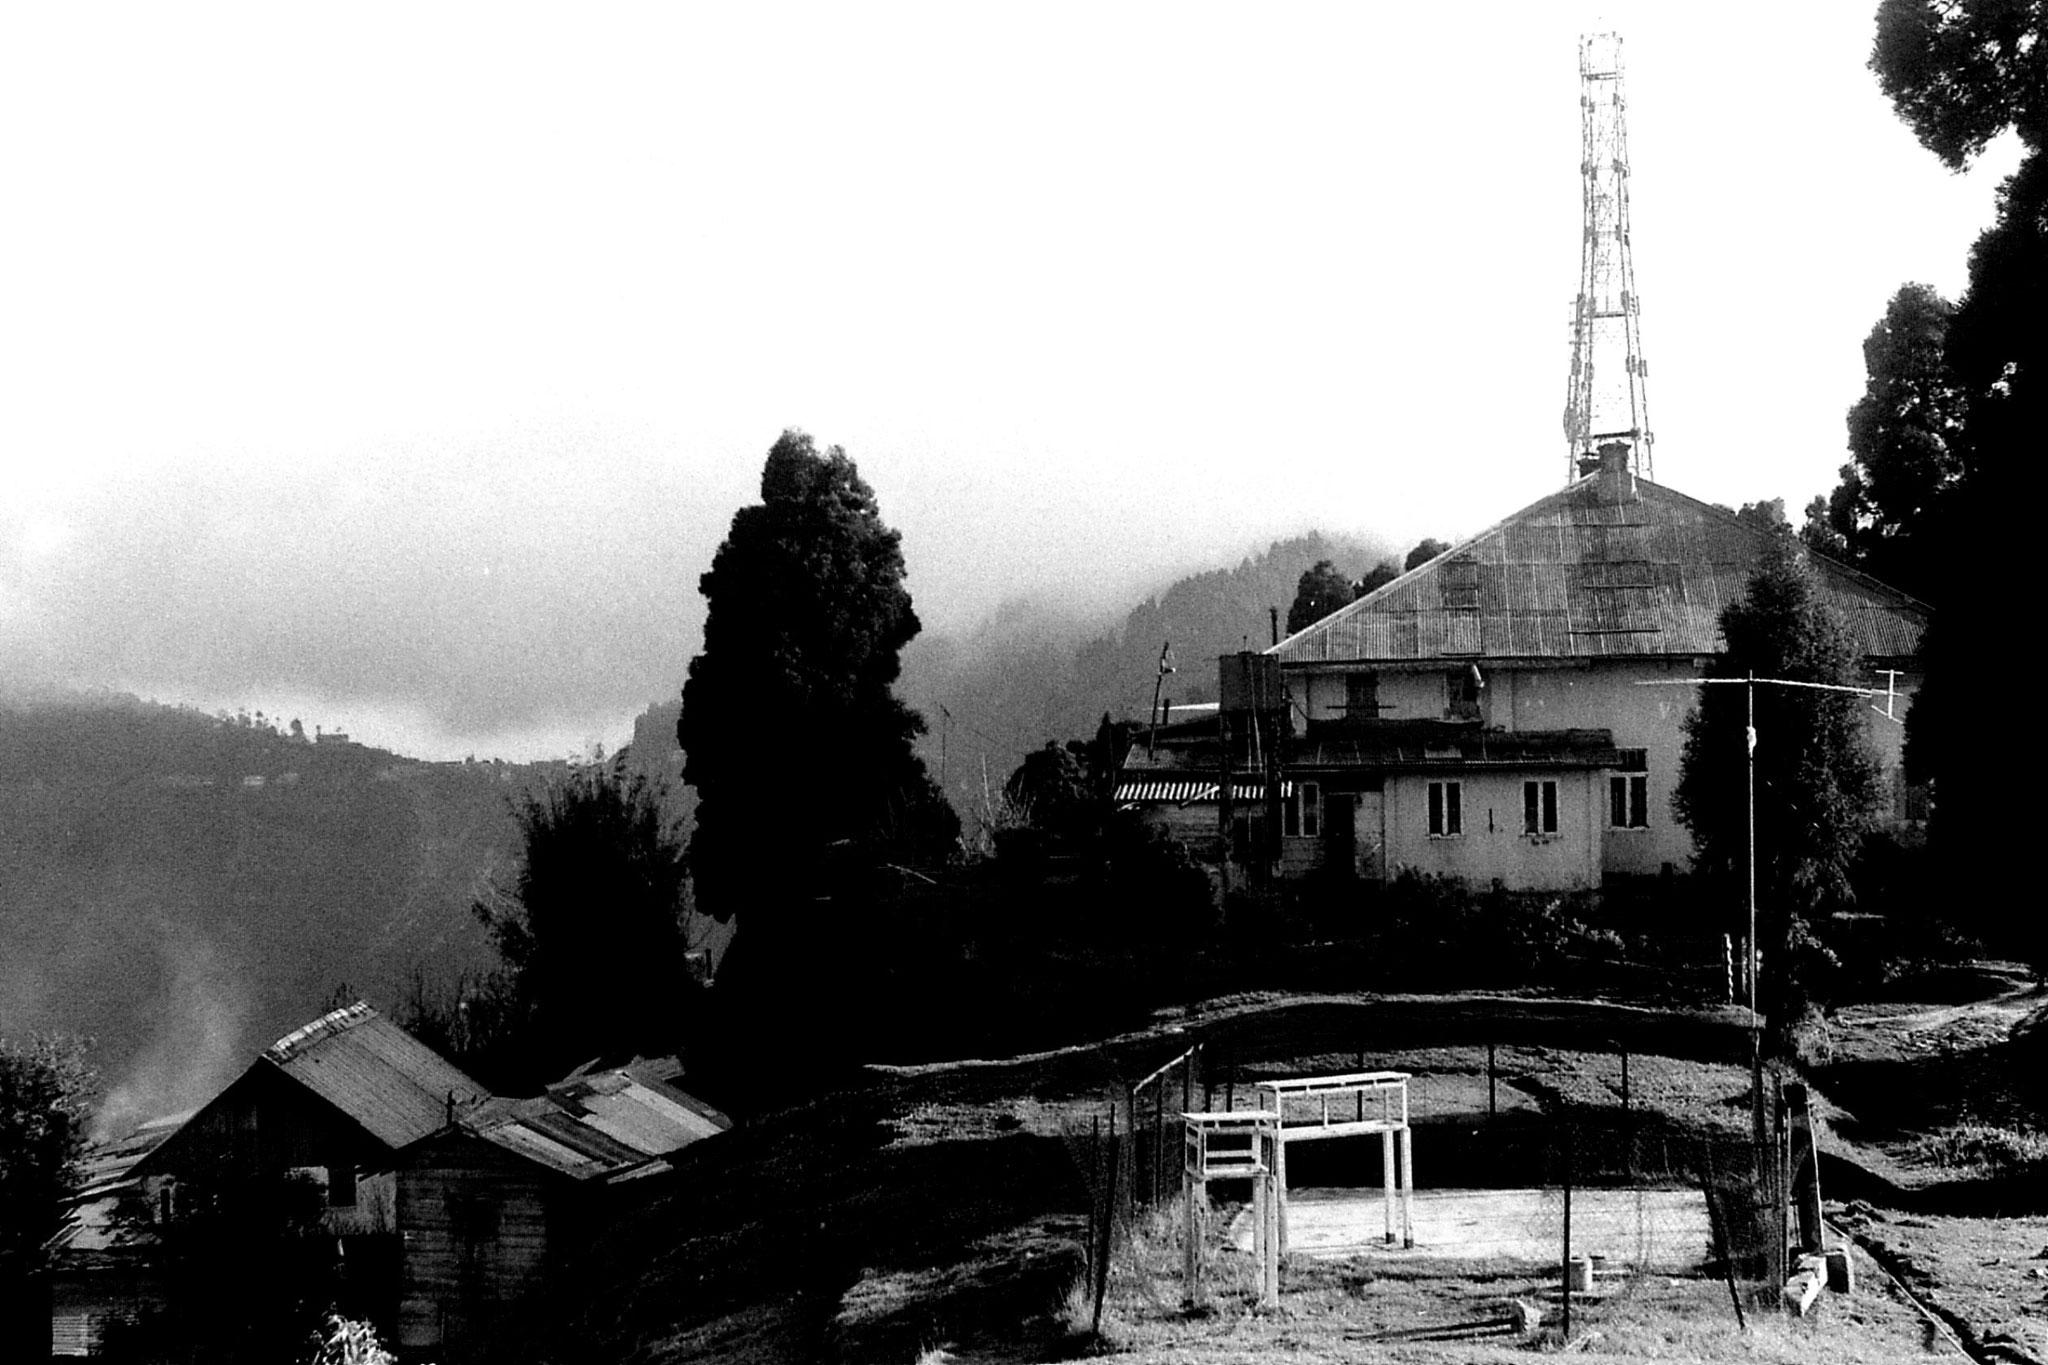 1/5/1990: 9: Darjeeling Vivien Leigh's birthplace